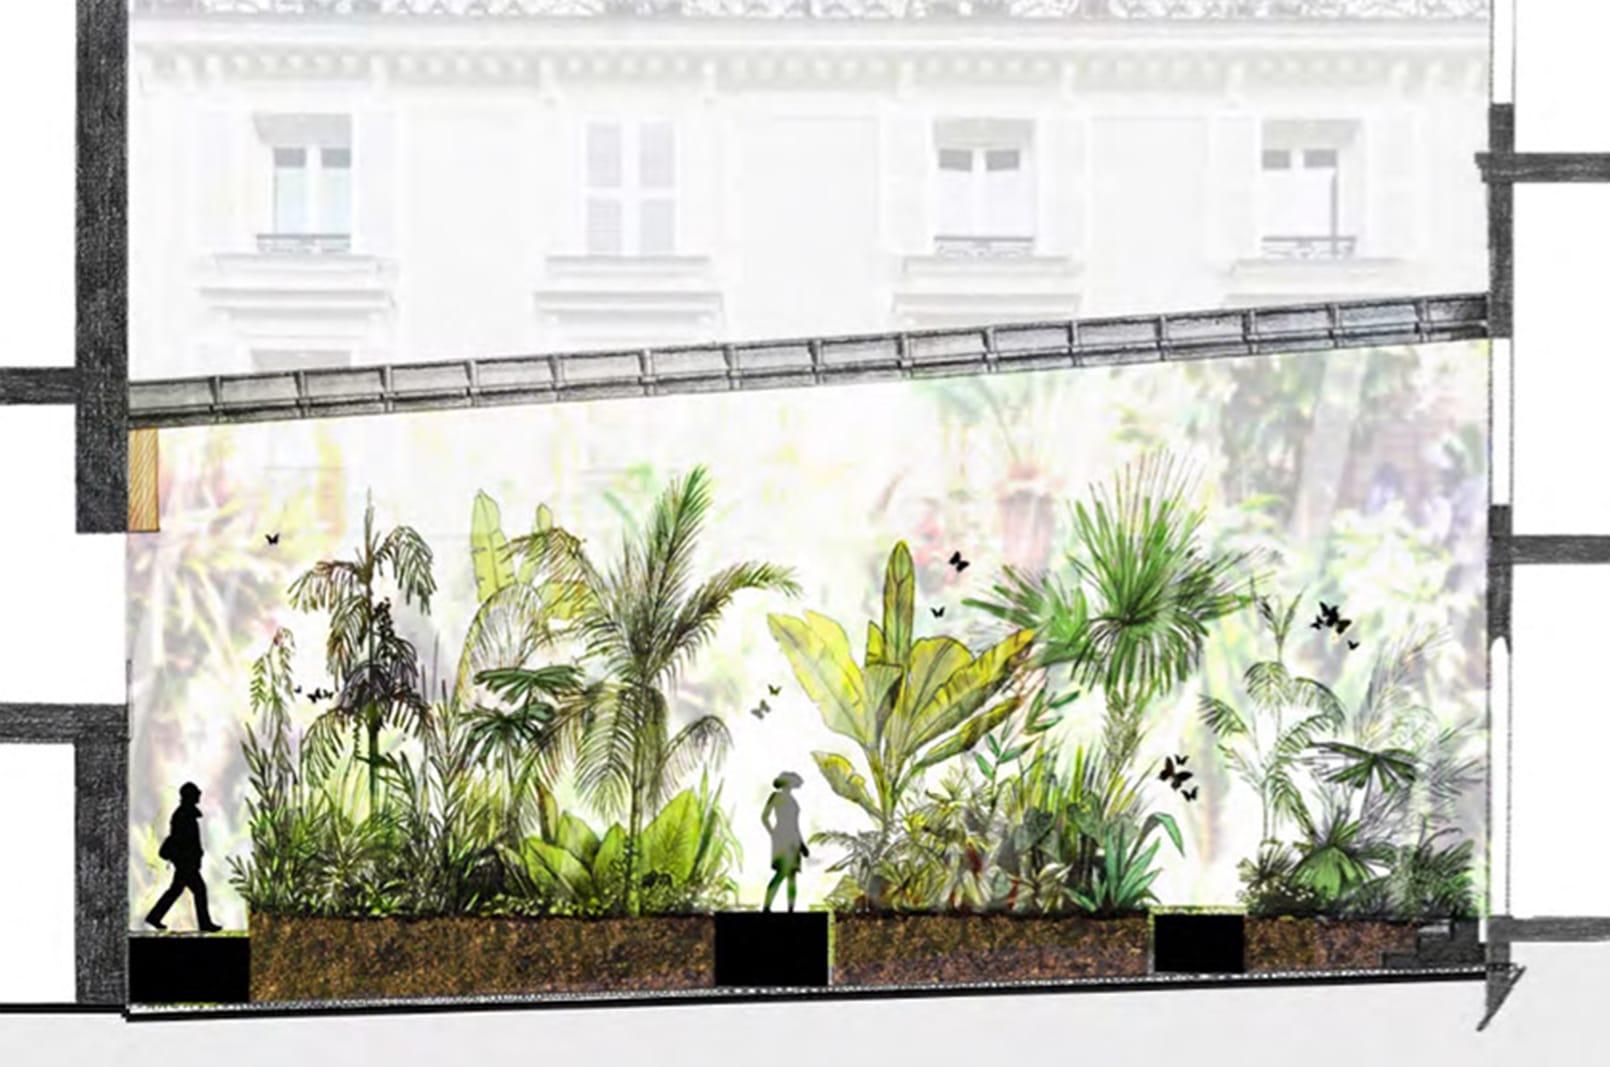 jardinmuseeparfum patioserreauxepices®Hermeline carpentier